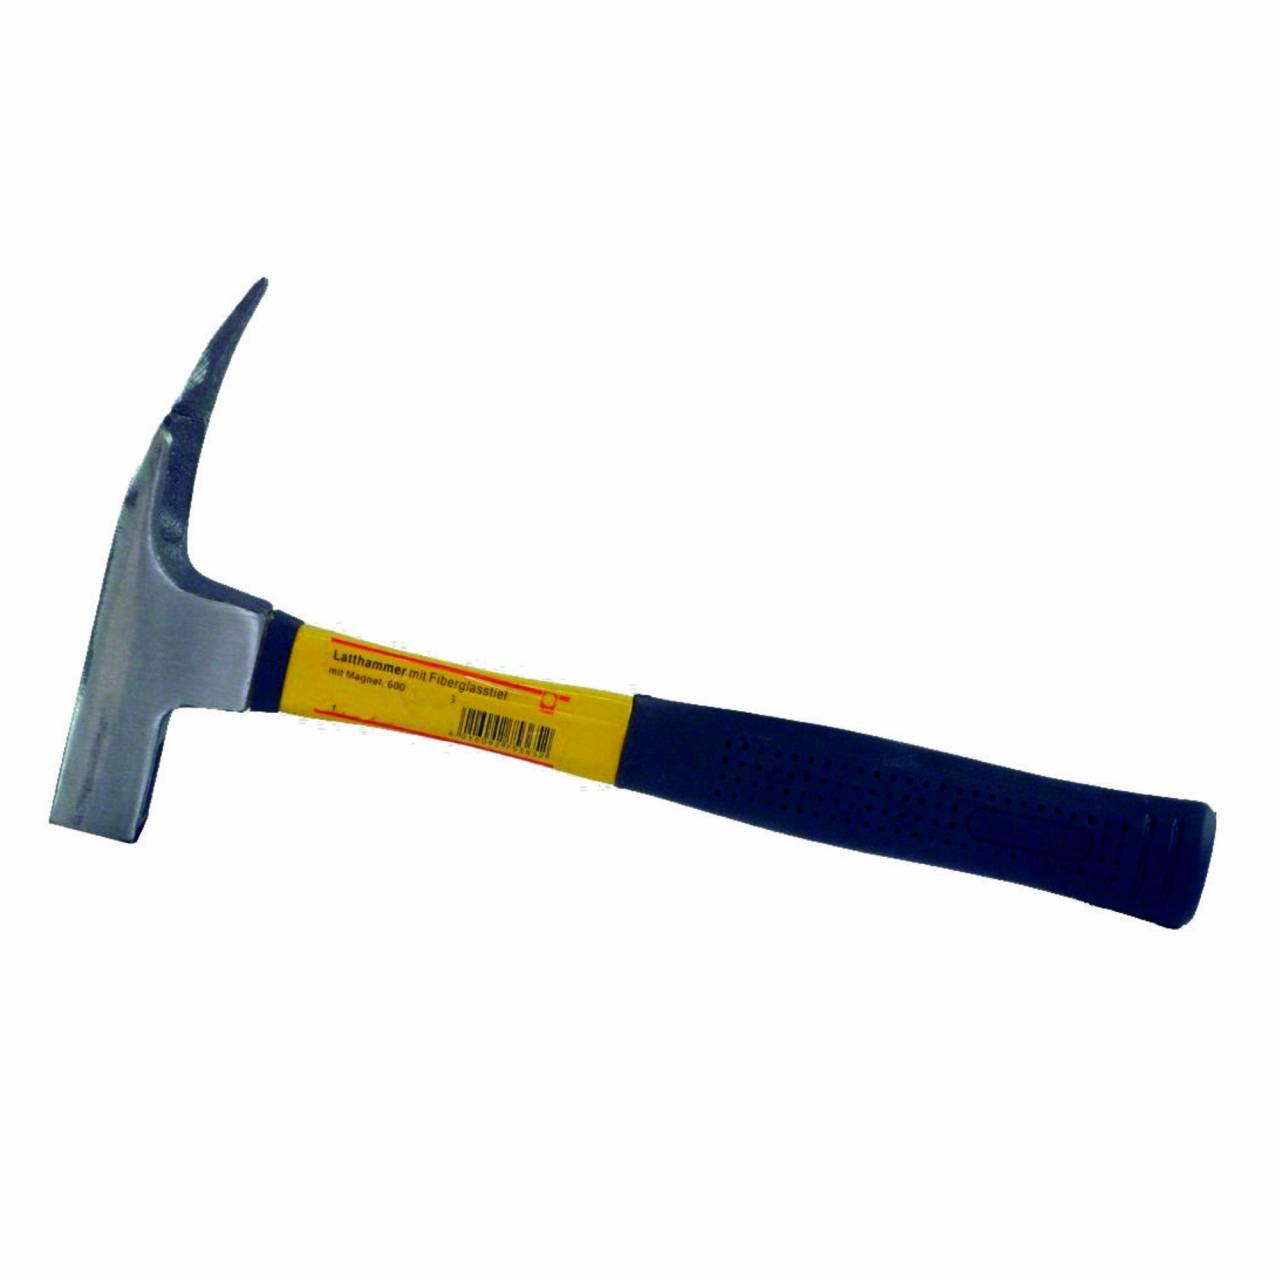 Latthammer mit Magnet, Fiberglasstiel